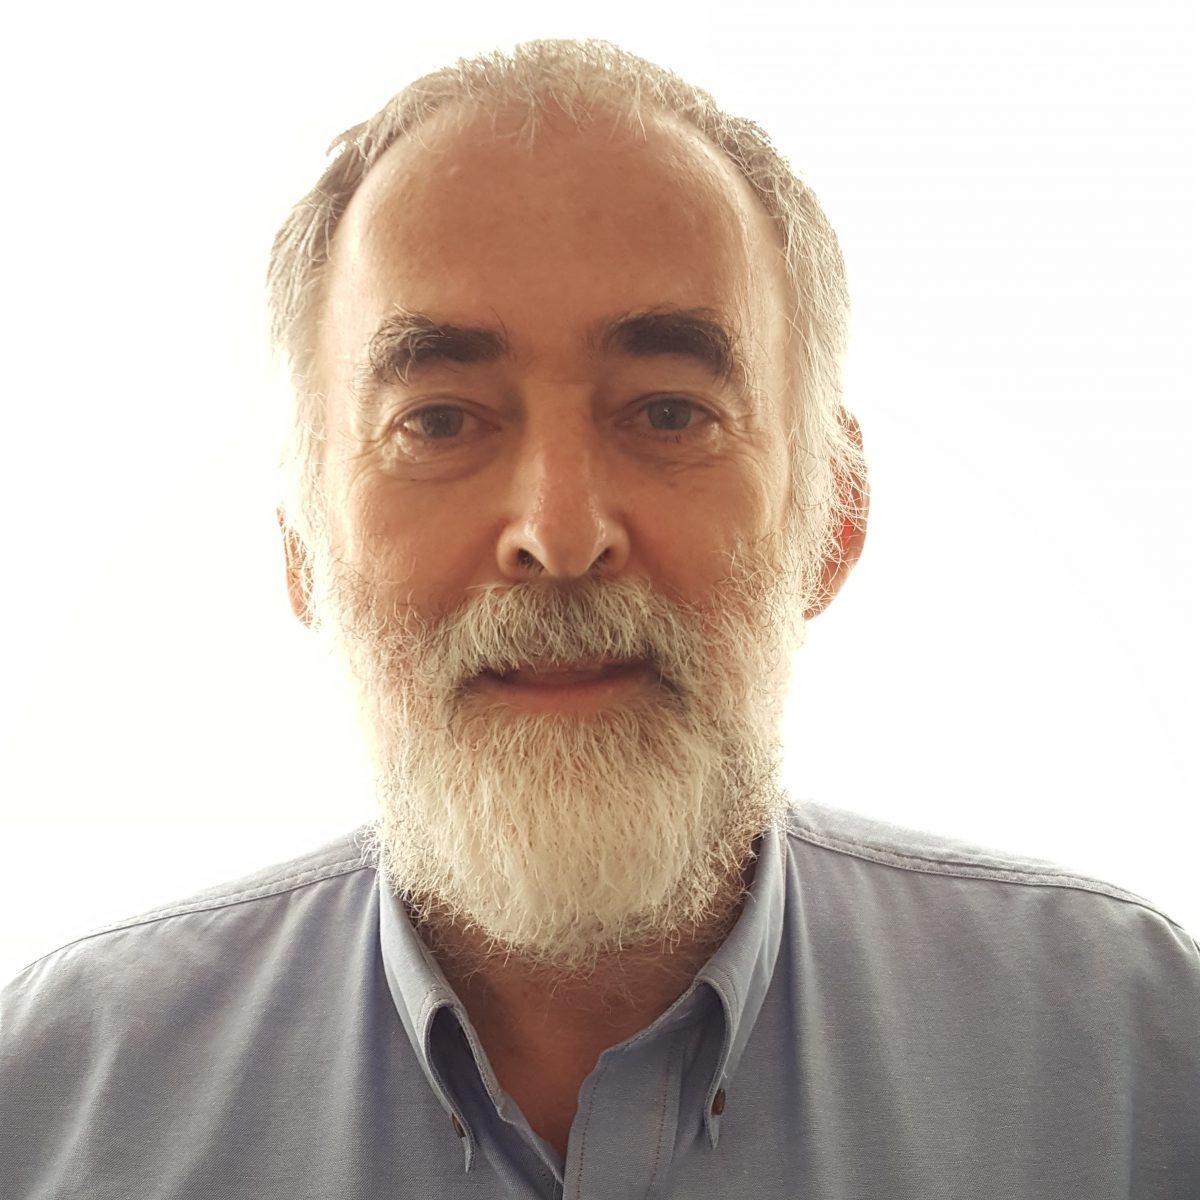 Western Australia Director